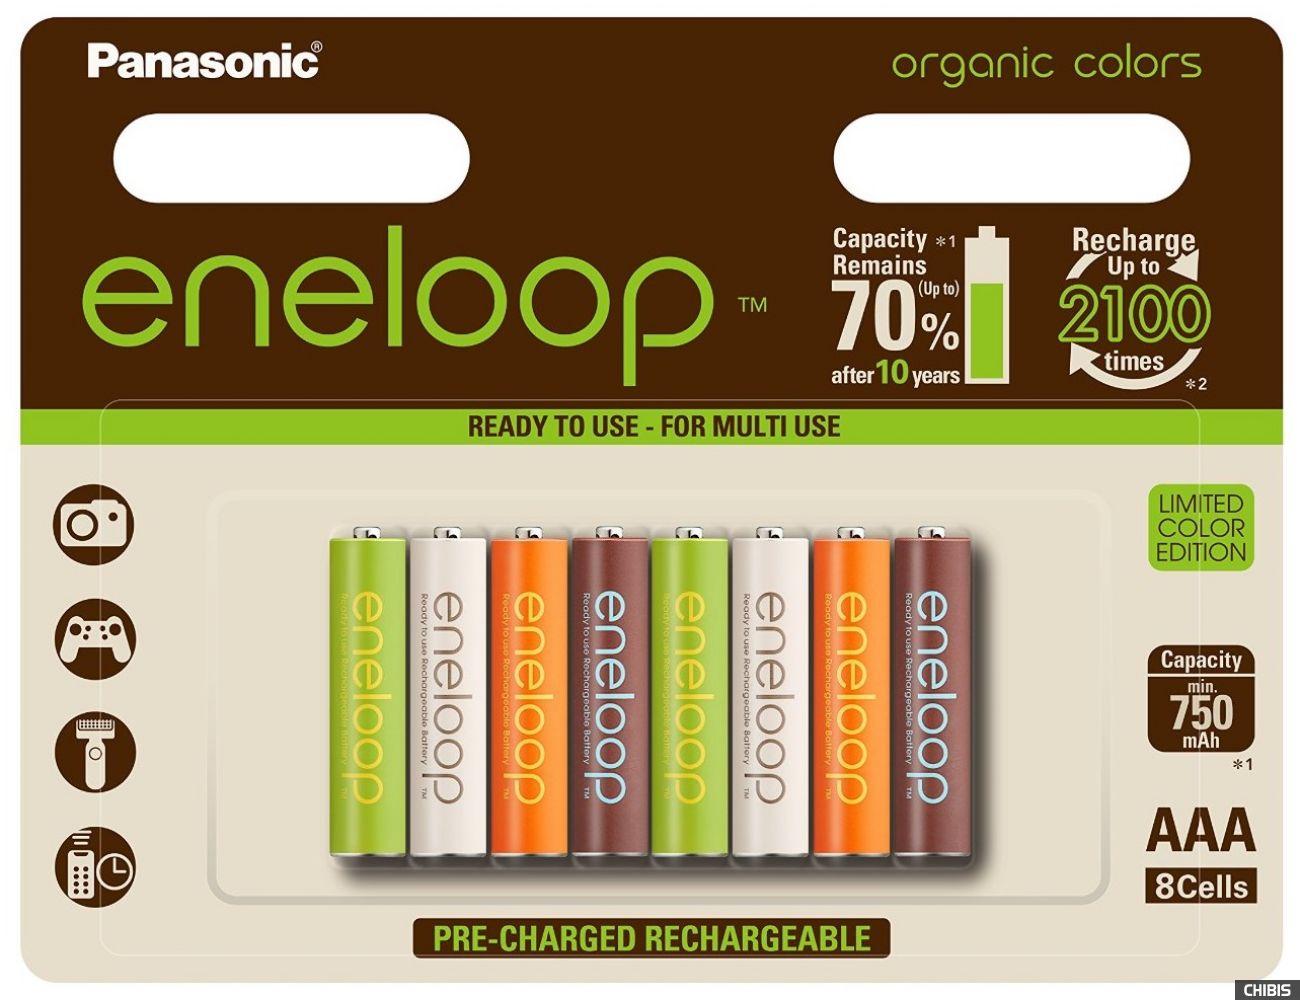 Аккумуляторные батарейки ААА Panasonic 750 mAh Eneloop Organic Colors 8HH Ni-MH BK-4MCCE/8RE 8/8 шт